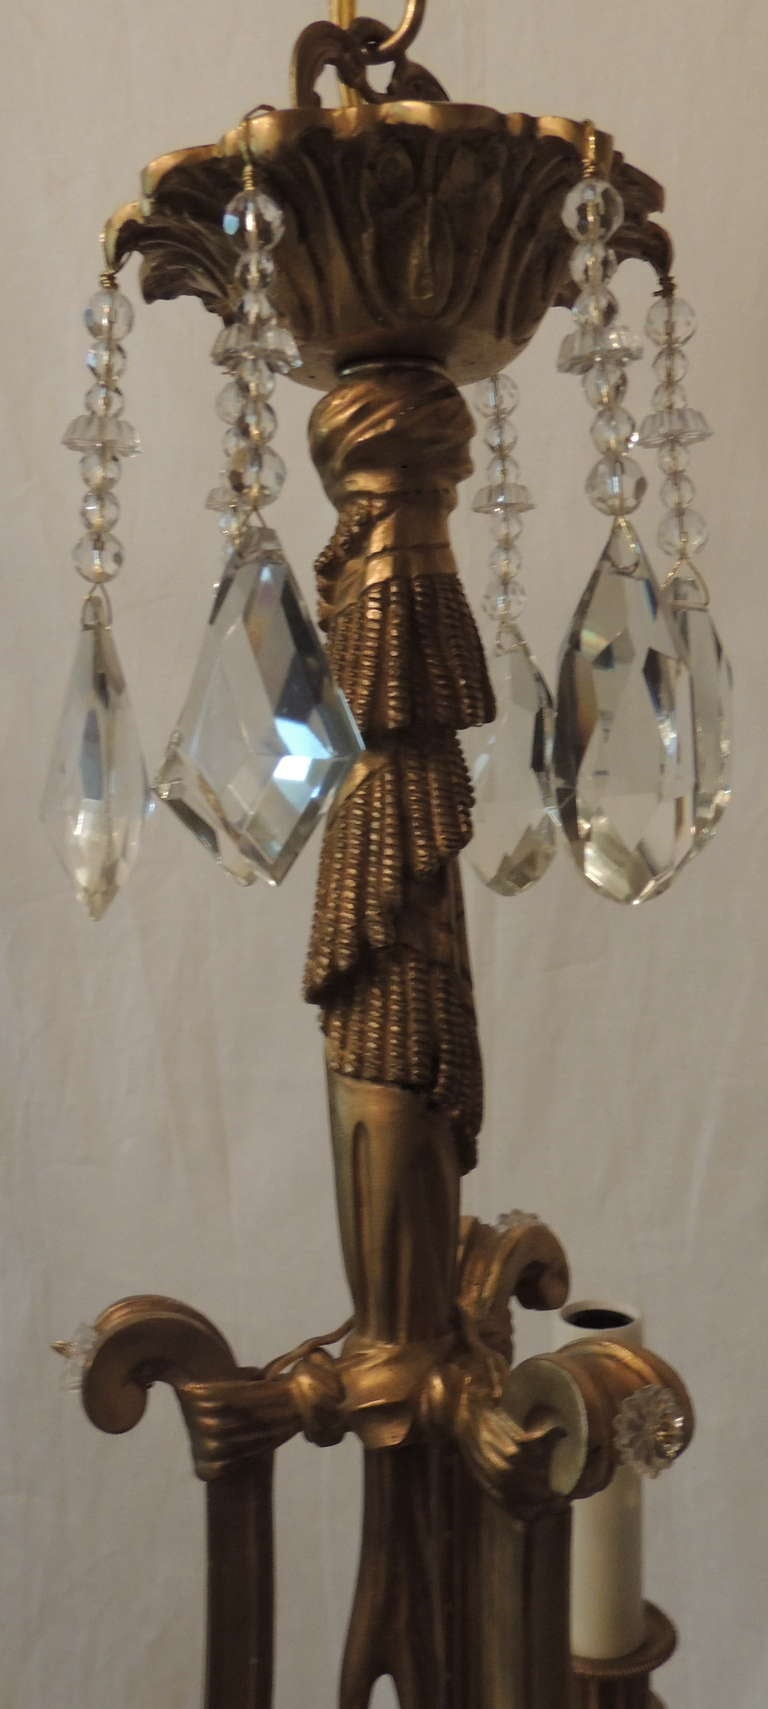 Elegant French Empire Doré Bronze Crystal Three-Light Fixture Chandelier For Sale 1